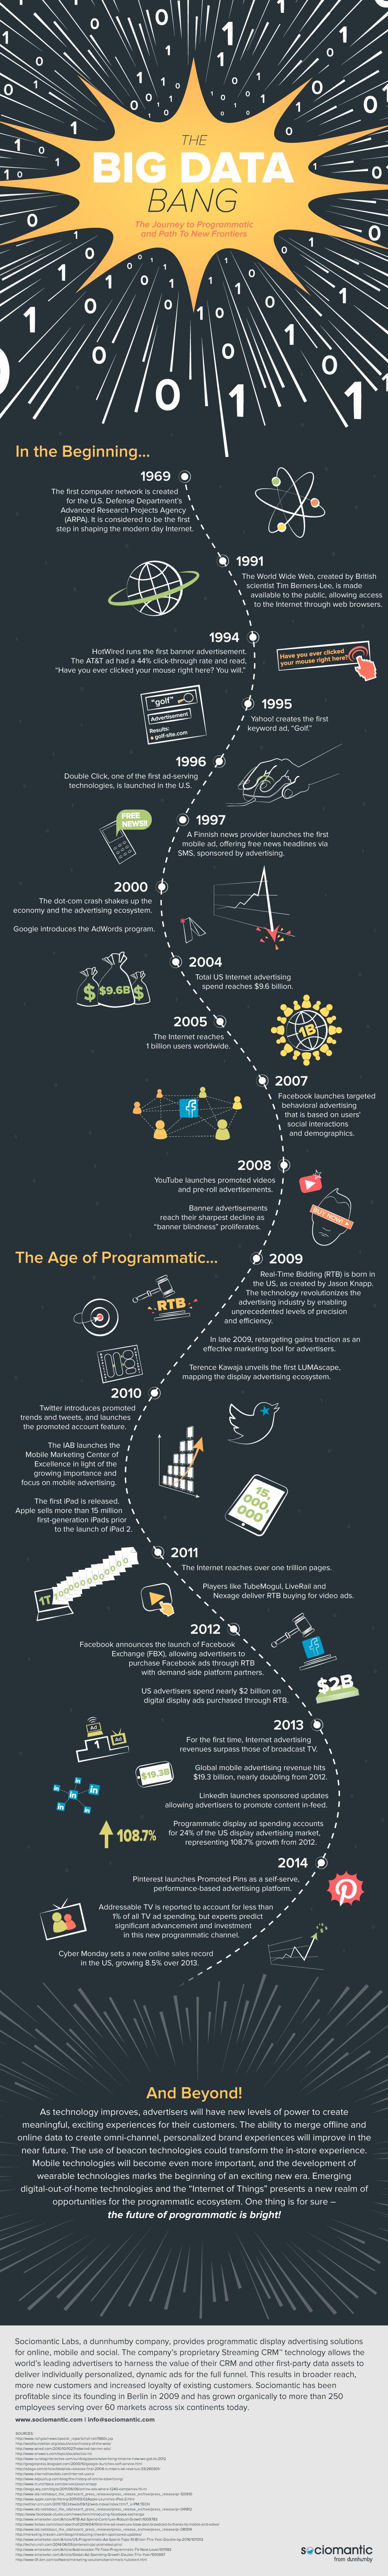 buyuk_data_patlamasi_infografik